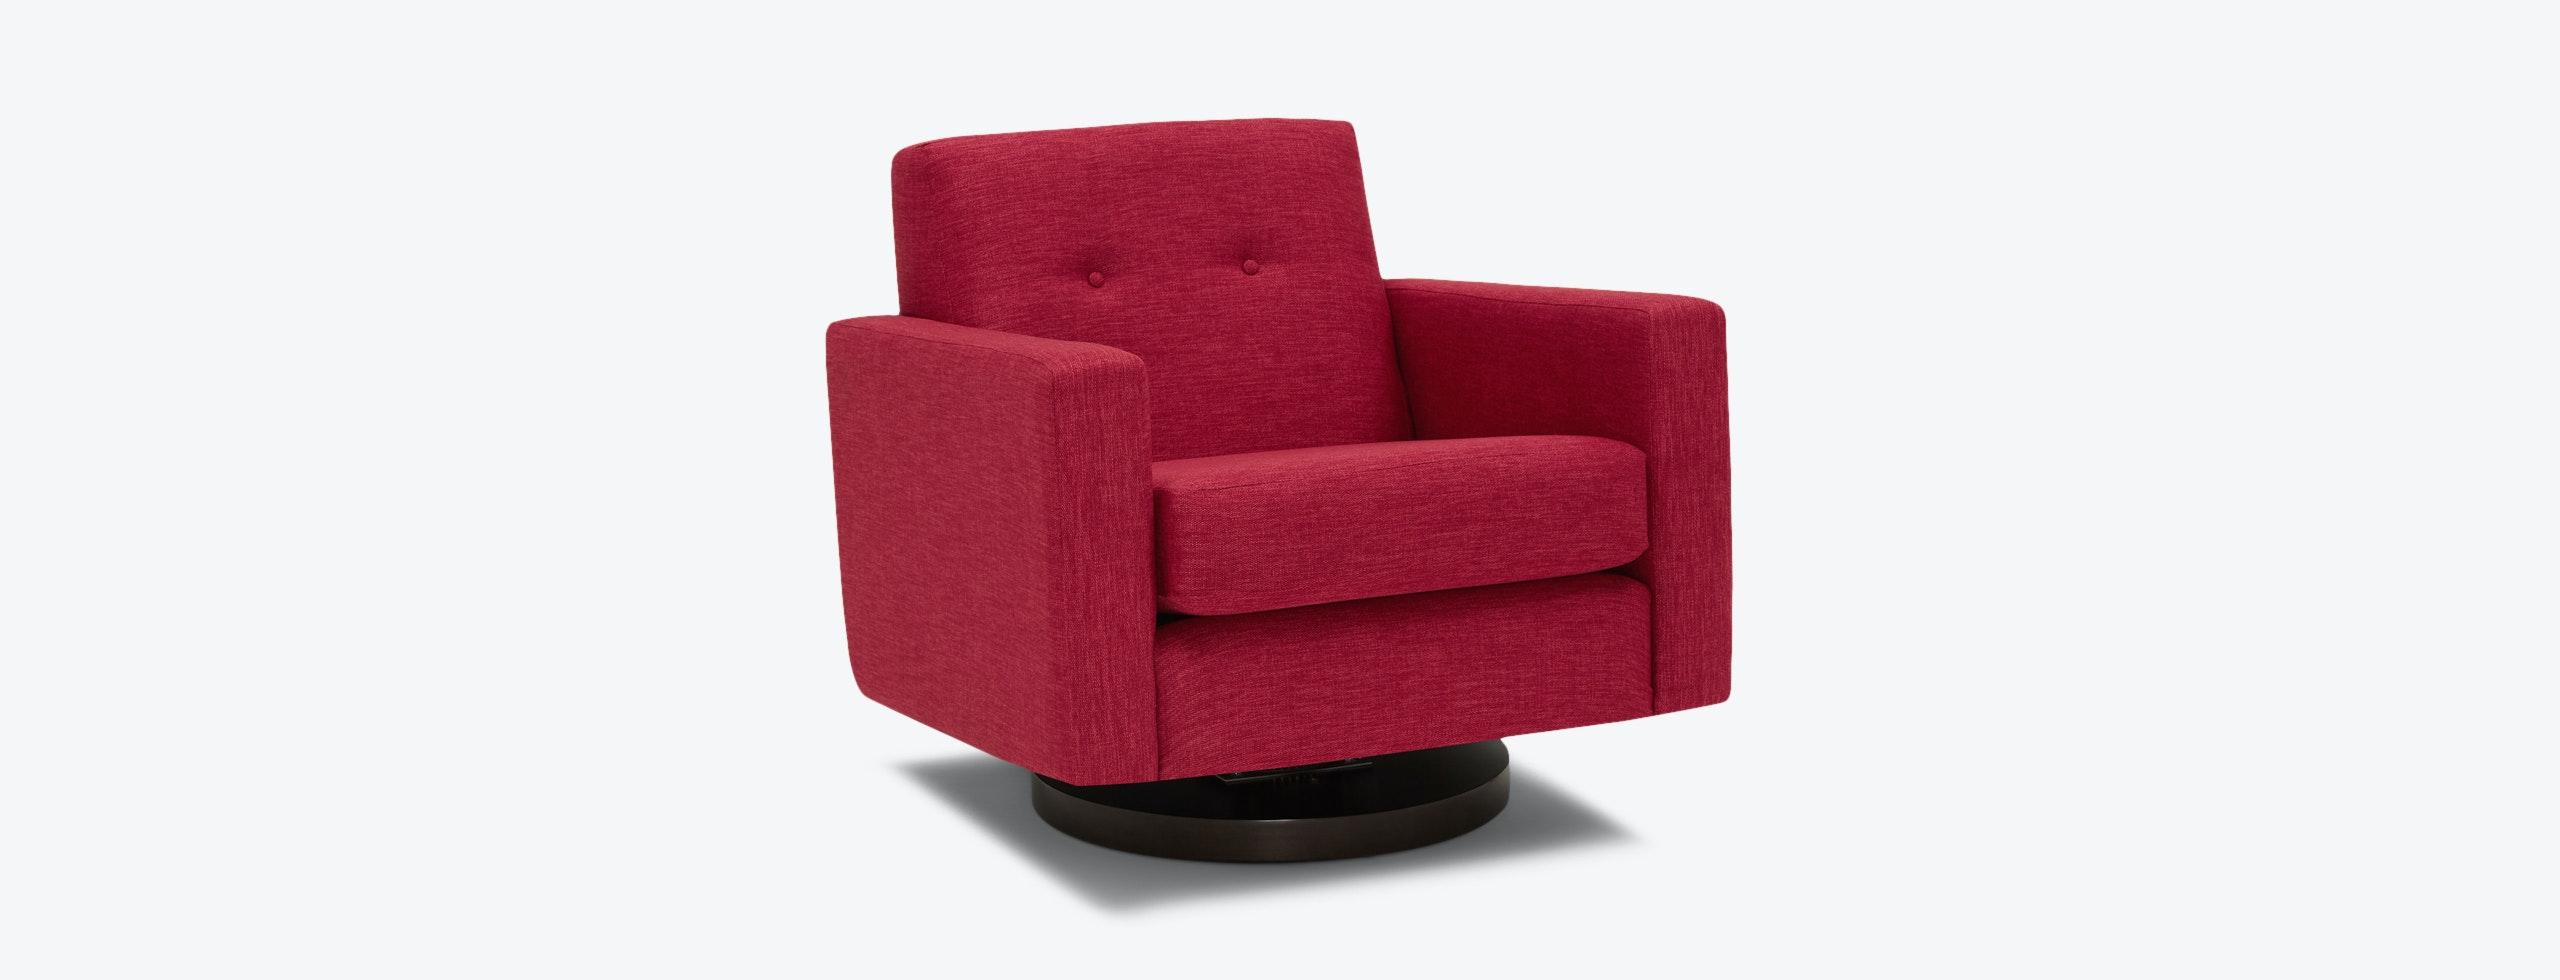 Incredible Korver Swivel Chair Theyellowbook Wood Chair Design Ideas Theyellowbookinfo